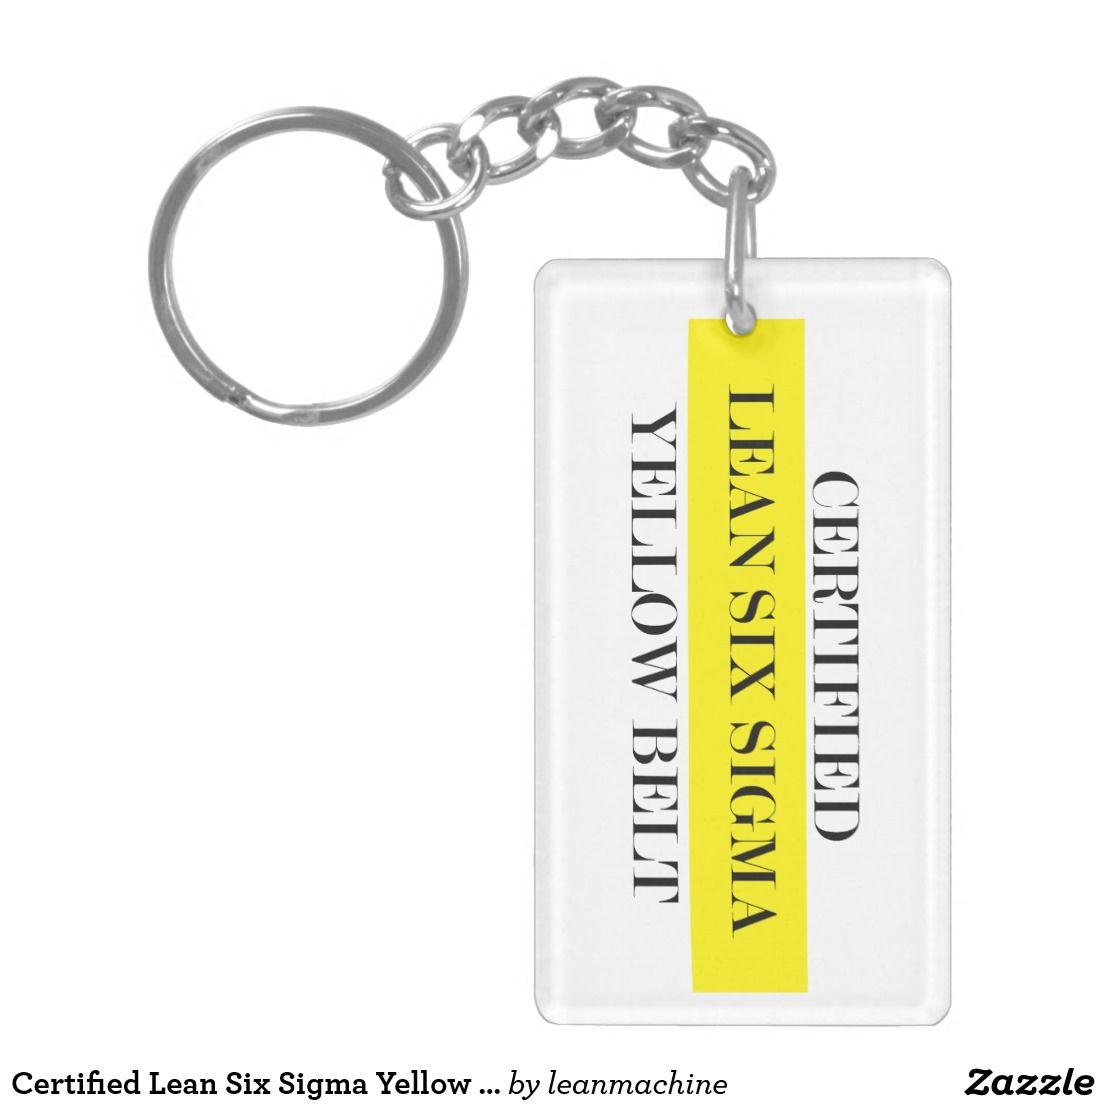 Certified Lean Six Sigma Yellow Belt Key Chain